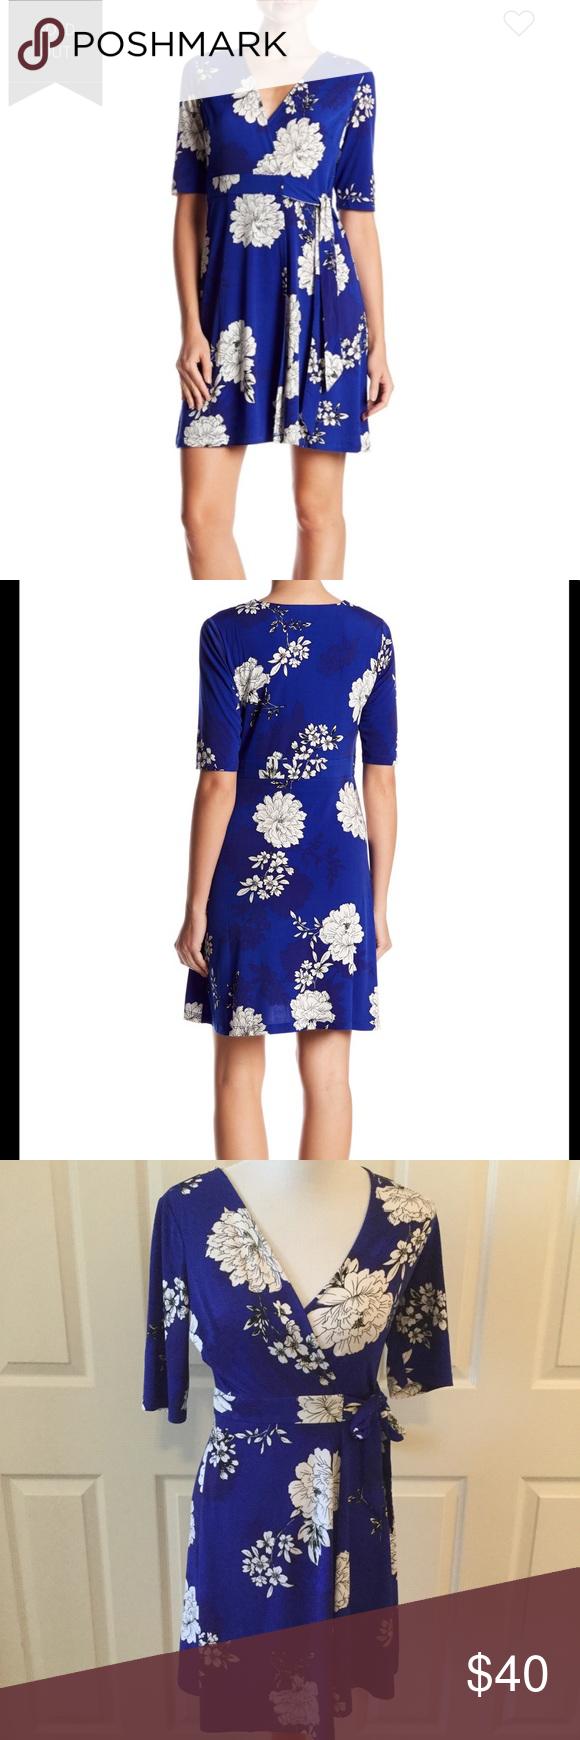 Royal Blue White Floral Vince Camuto Wrap Dress Royal Blue Dresses Wrap Dress Clothes Design [ 1740 x 580 Pixel ]